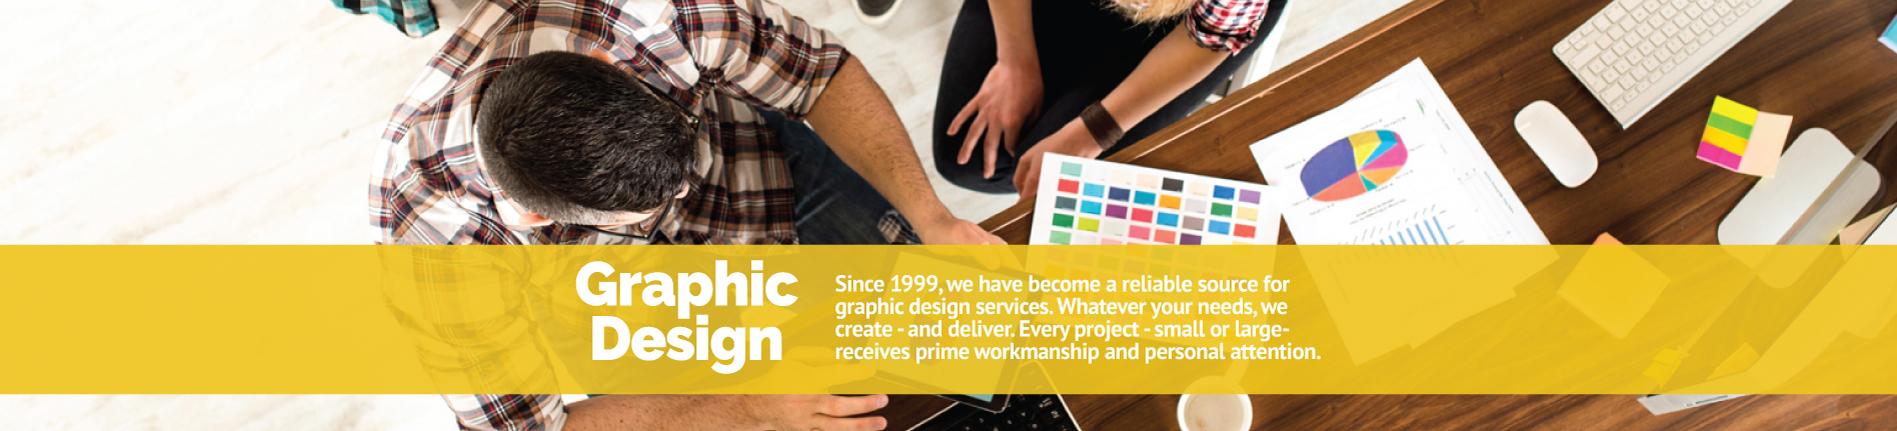 ElectroImage_graphicdesign_slider1